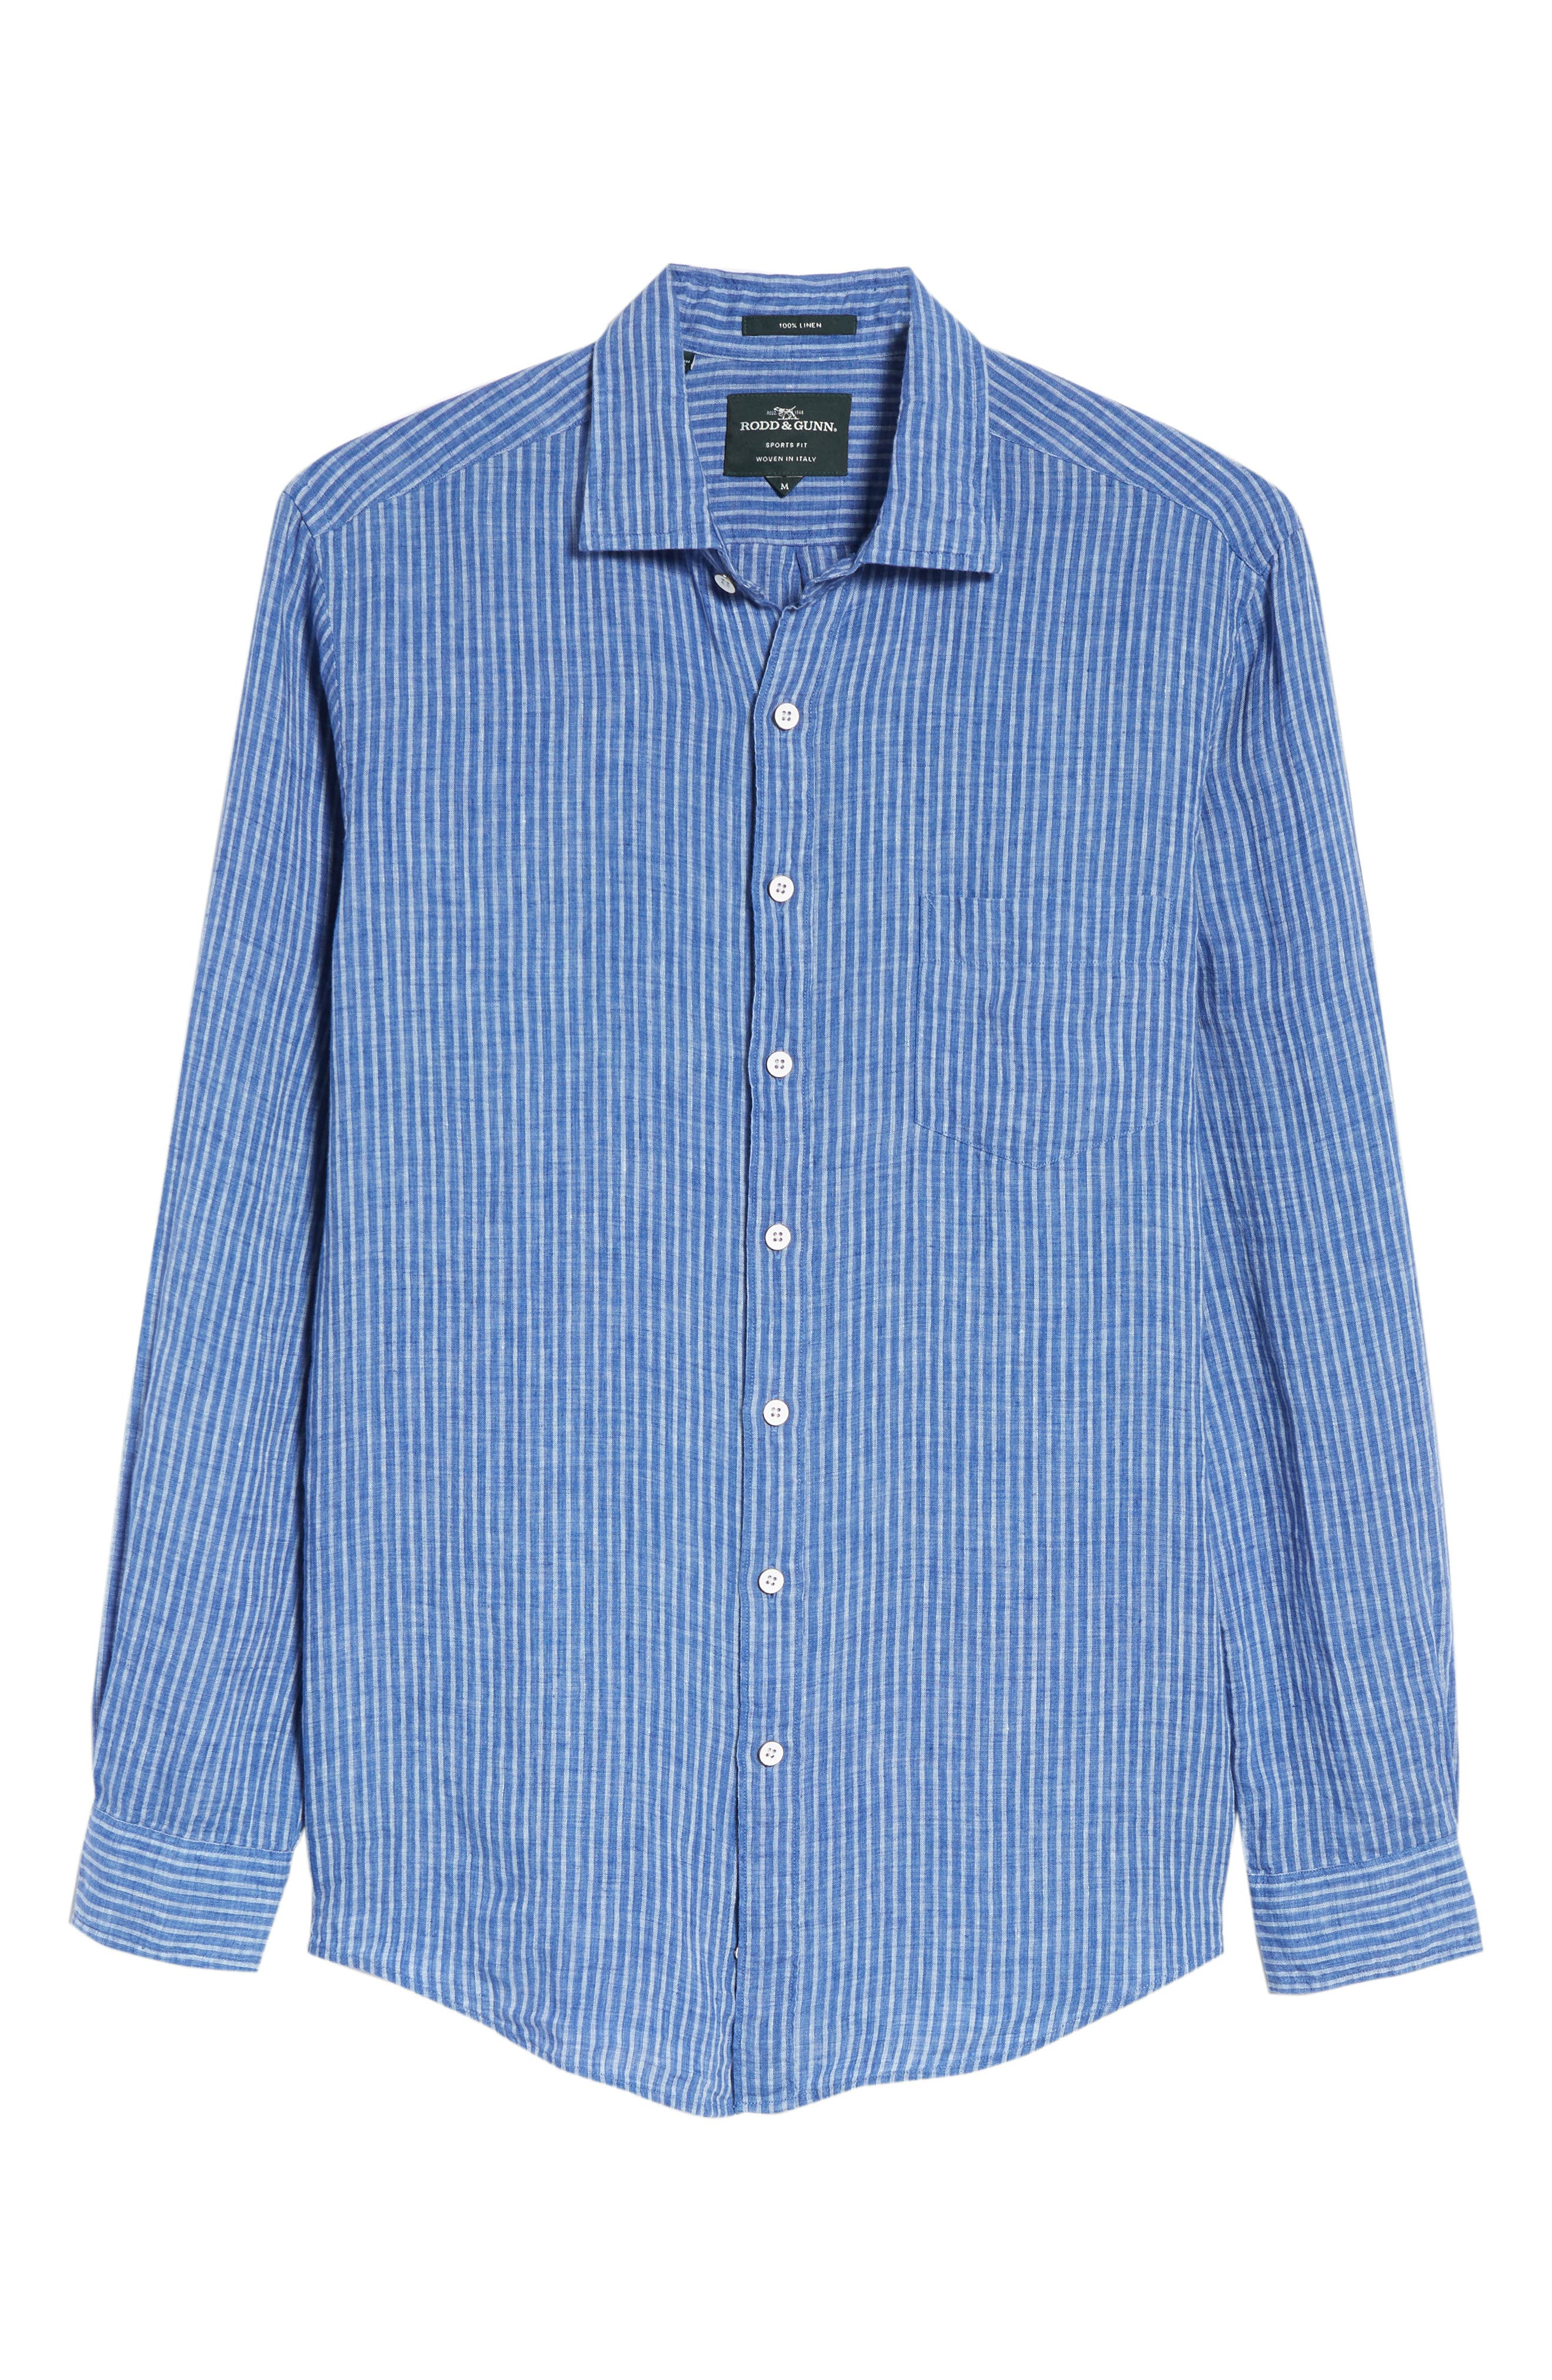 Warwick Junction Stripe Linen Sport Shirt,                             Alternate thumbnail 6, color,                             ULTRAMARINE